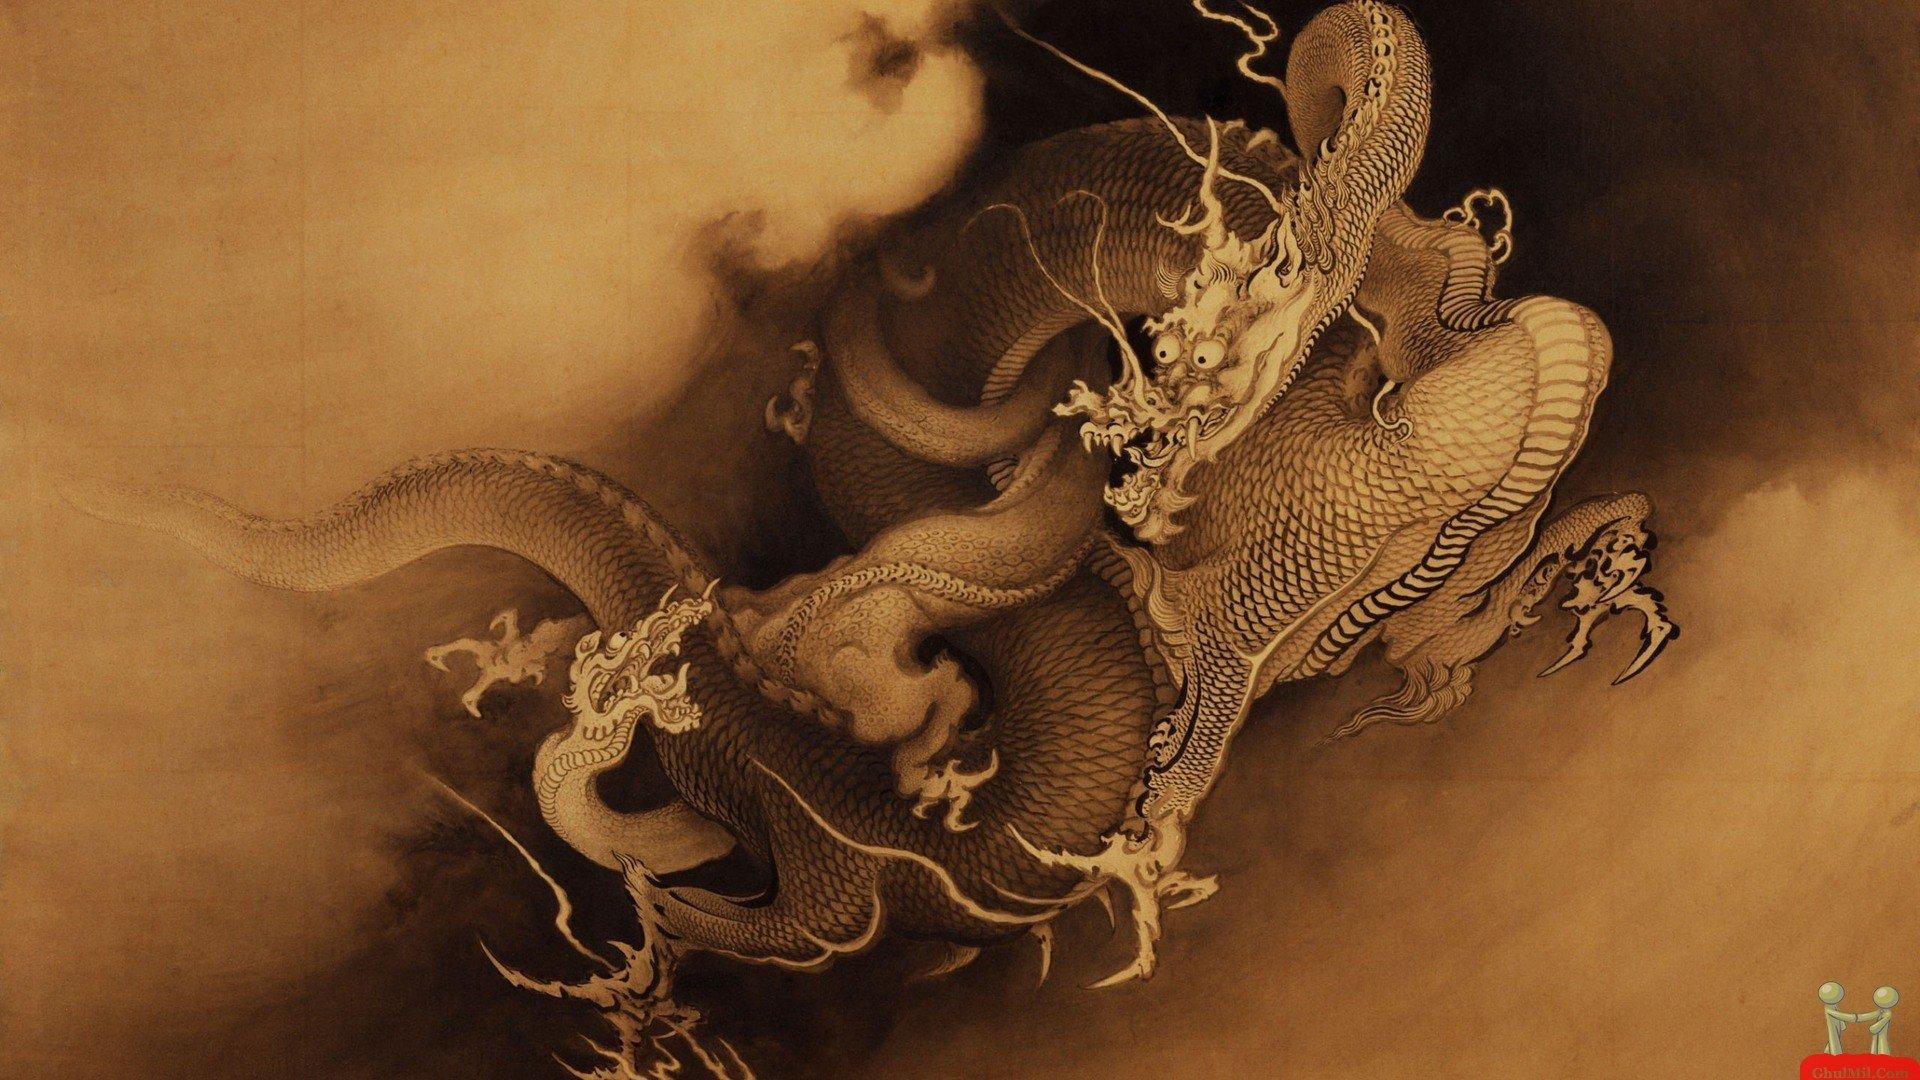 3D Dragon Fight HD Wallpaper For Desktop HD Wallpapers 1920x1080